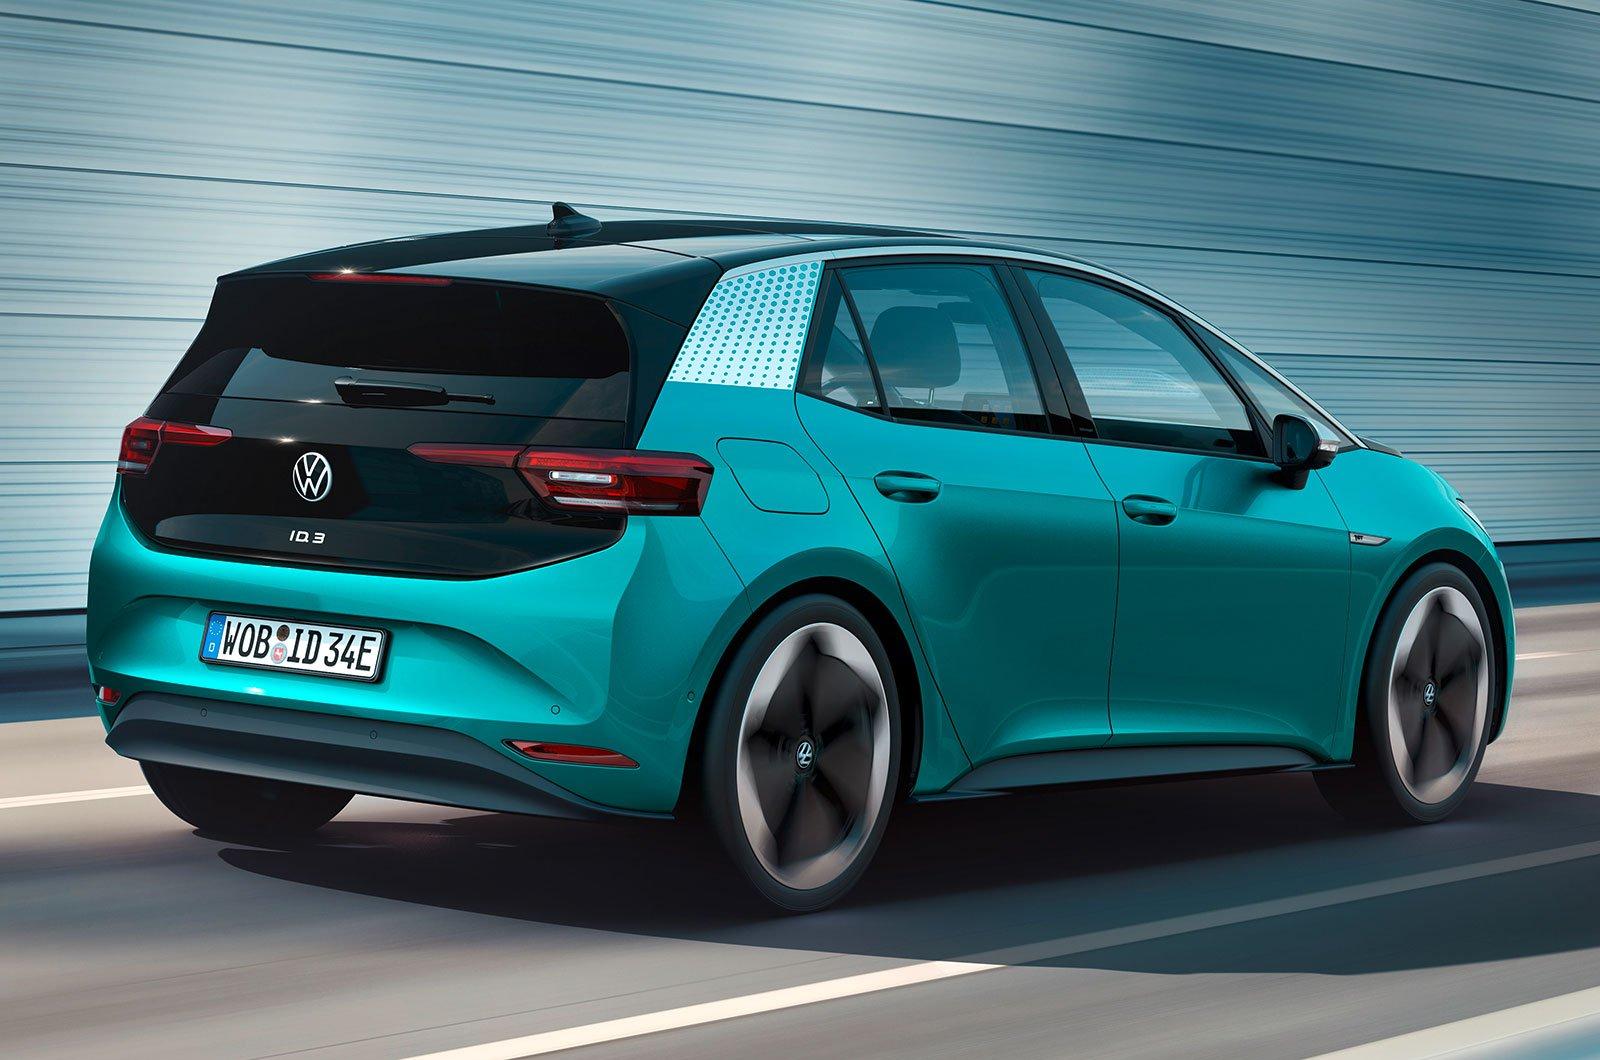 2020 Volkswagen ID 3 rear